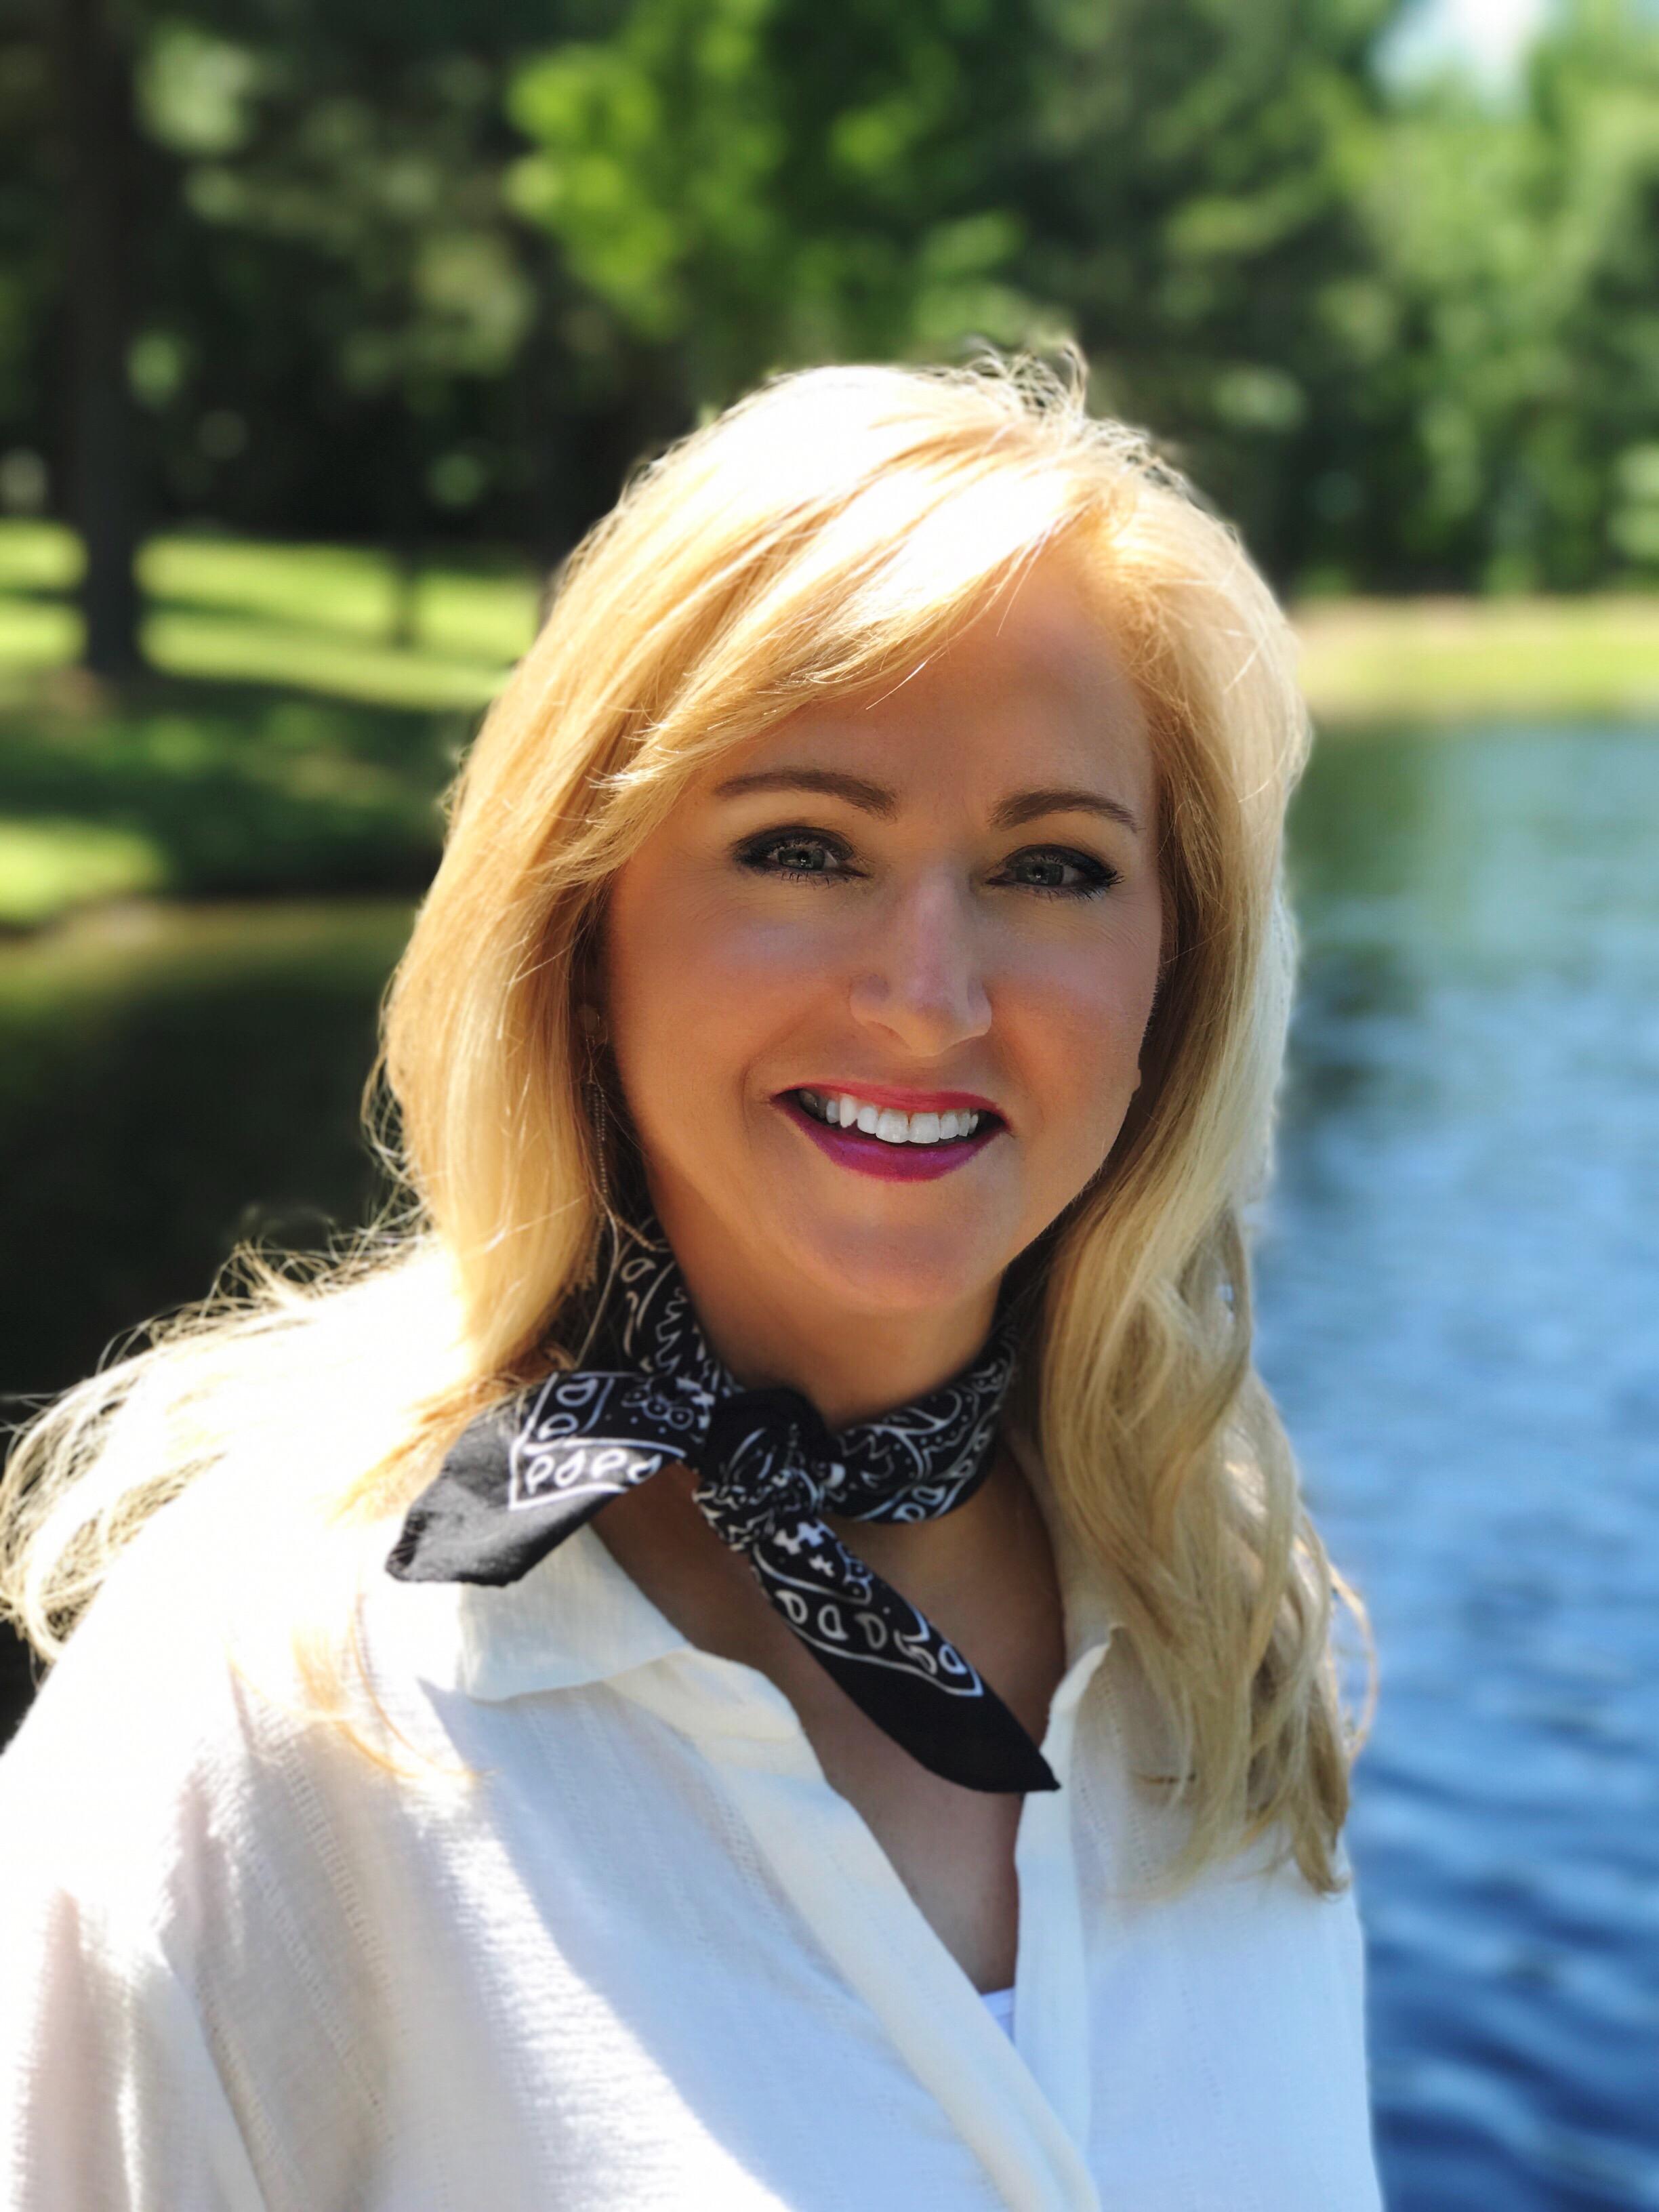 Melanie Redd on SunSparkleShine.com